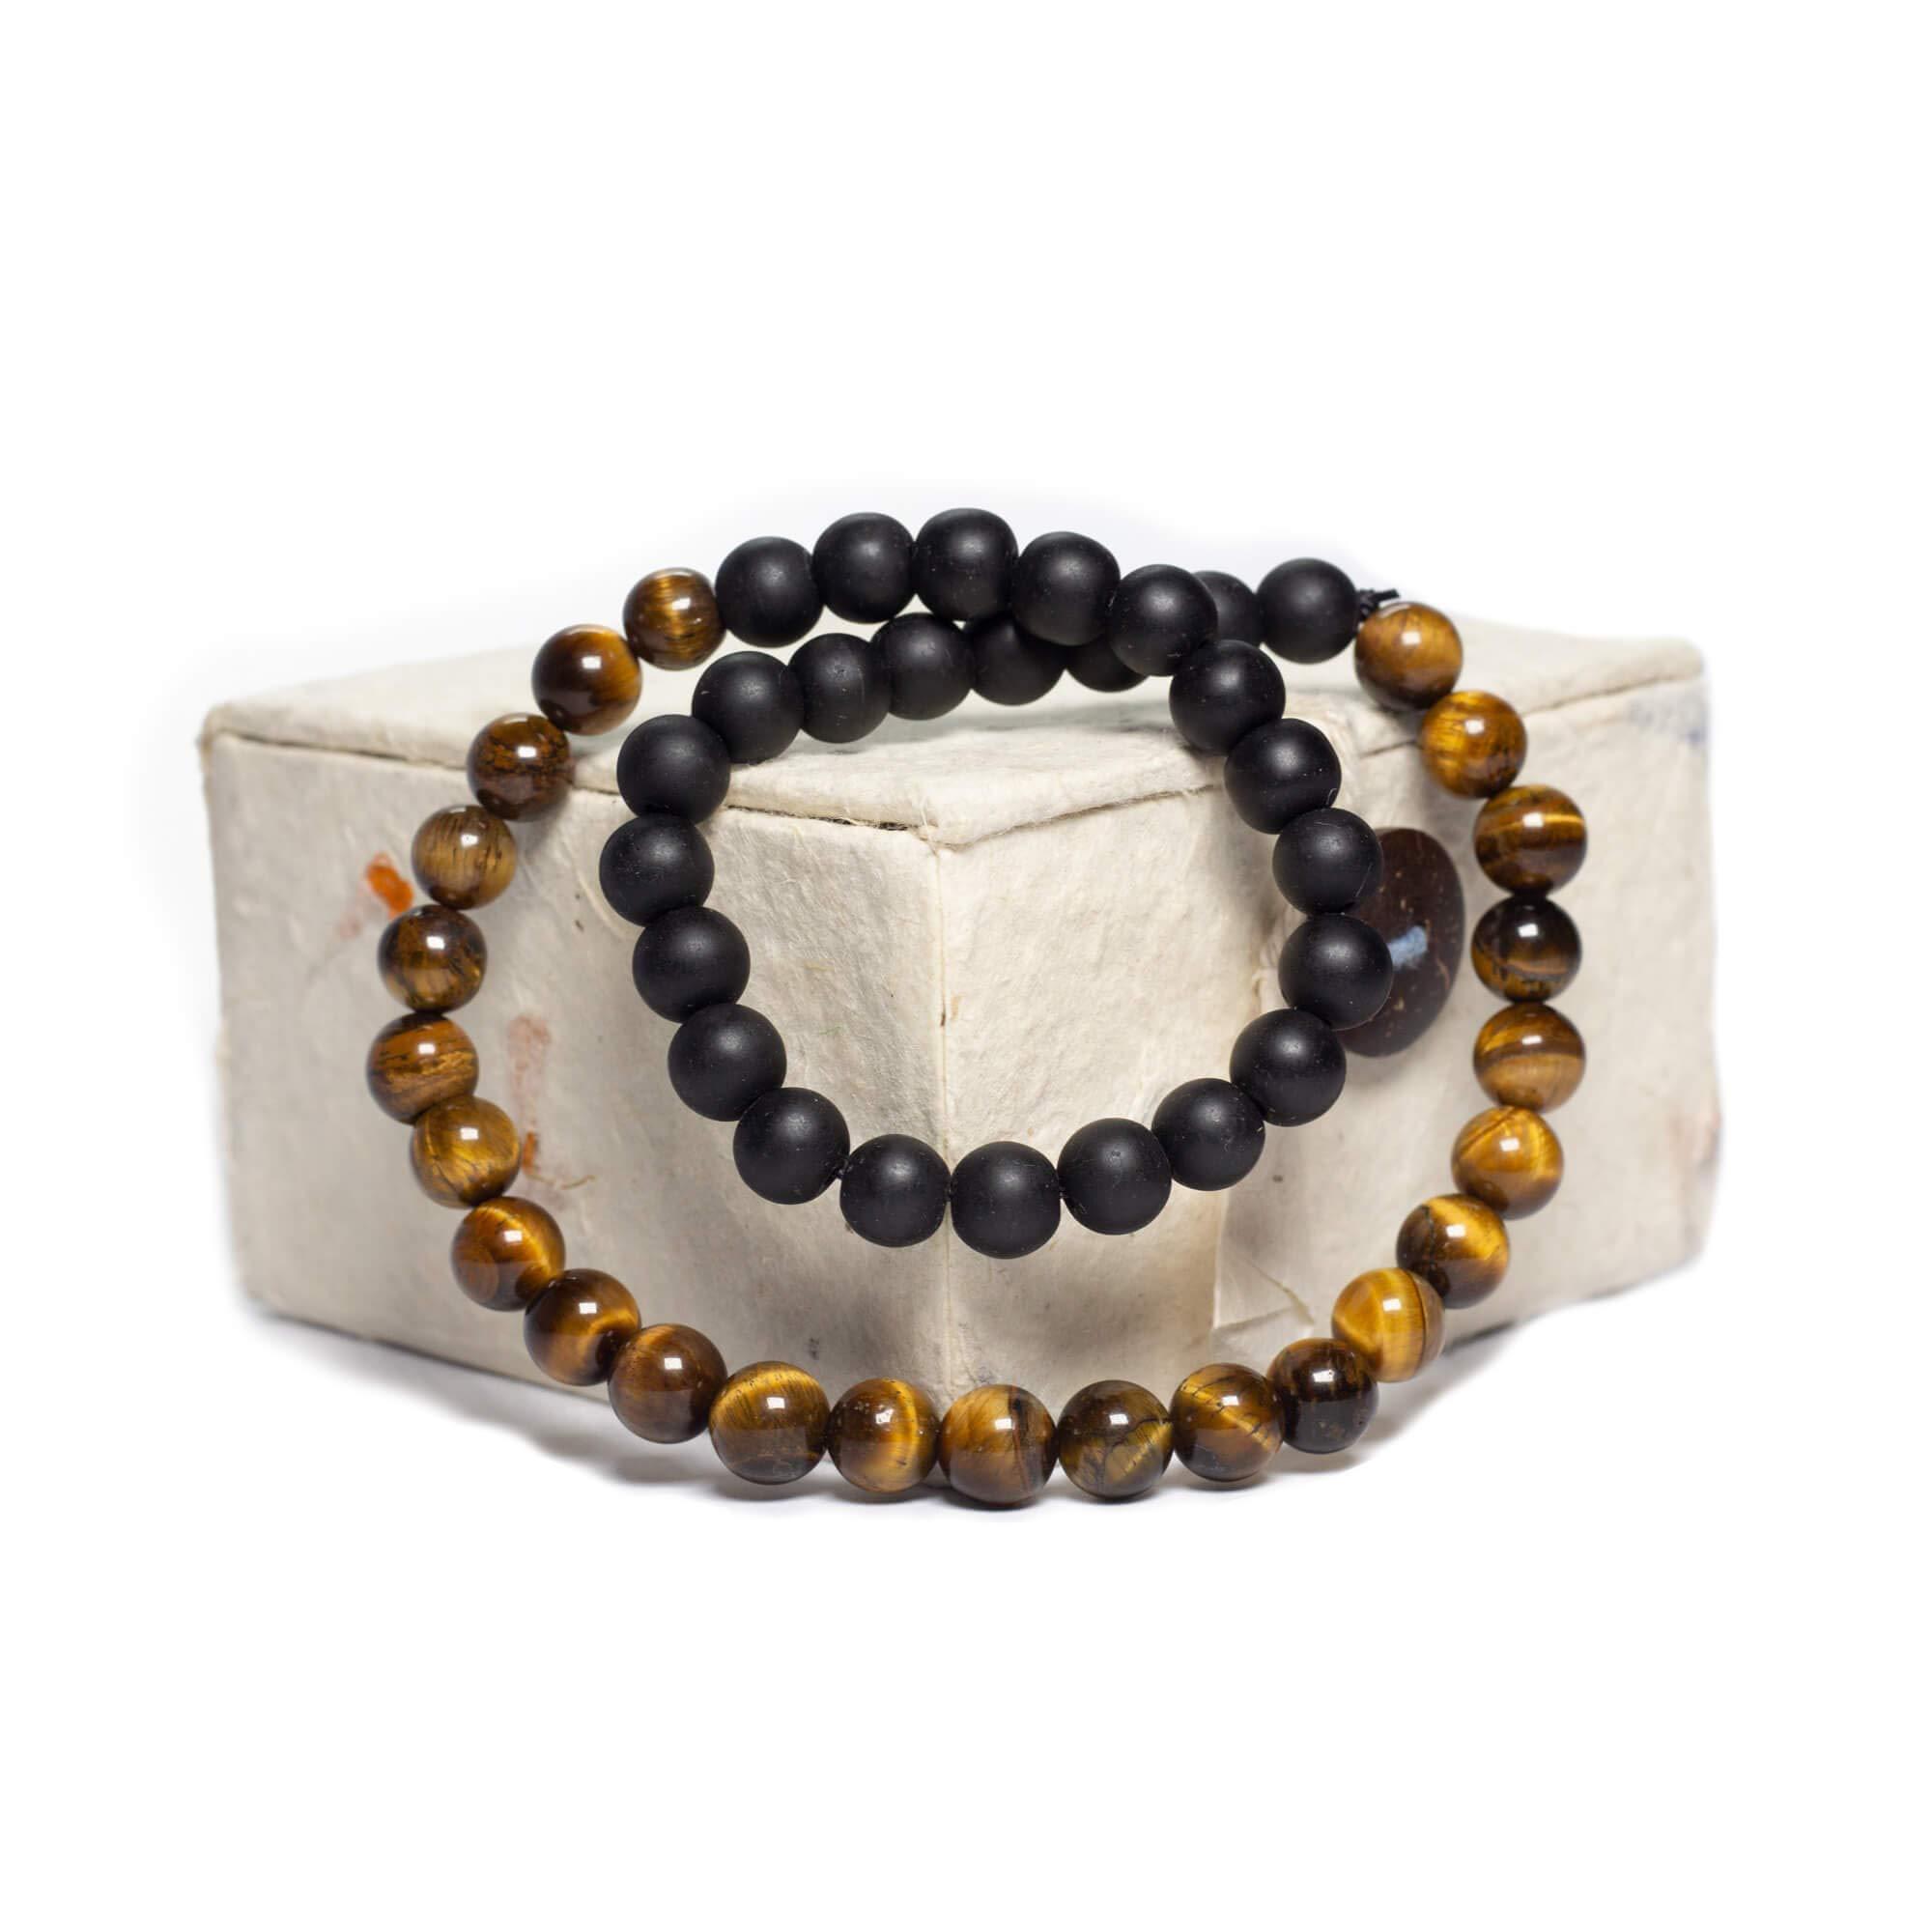 Handmade Beaded Double Wrap Bracelet (Tigers Eye & Black Onyx)- 8mm Comes With Detachable Charms, Cotton Bag & Gift Box - Meditation/Spiritual/Yoga Gift Set- Chakra Healing, Reiki, Health & Wellness